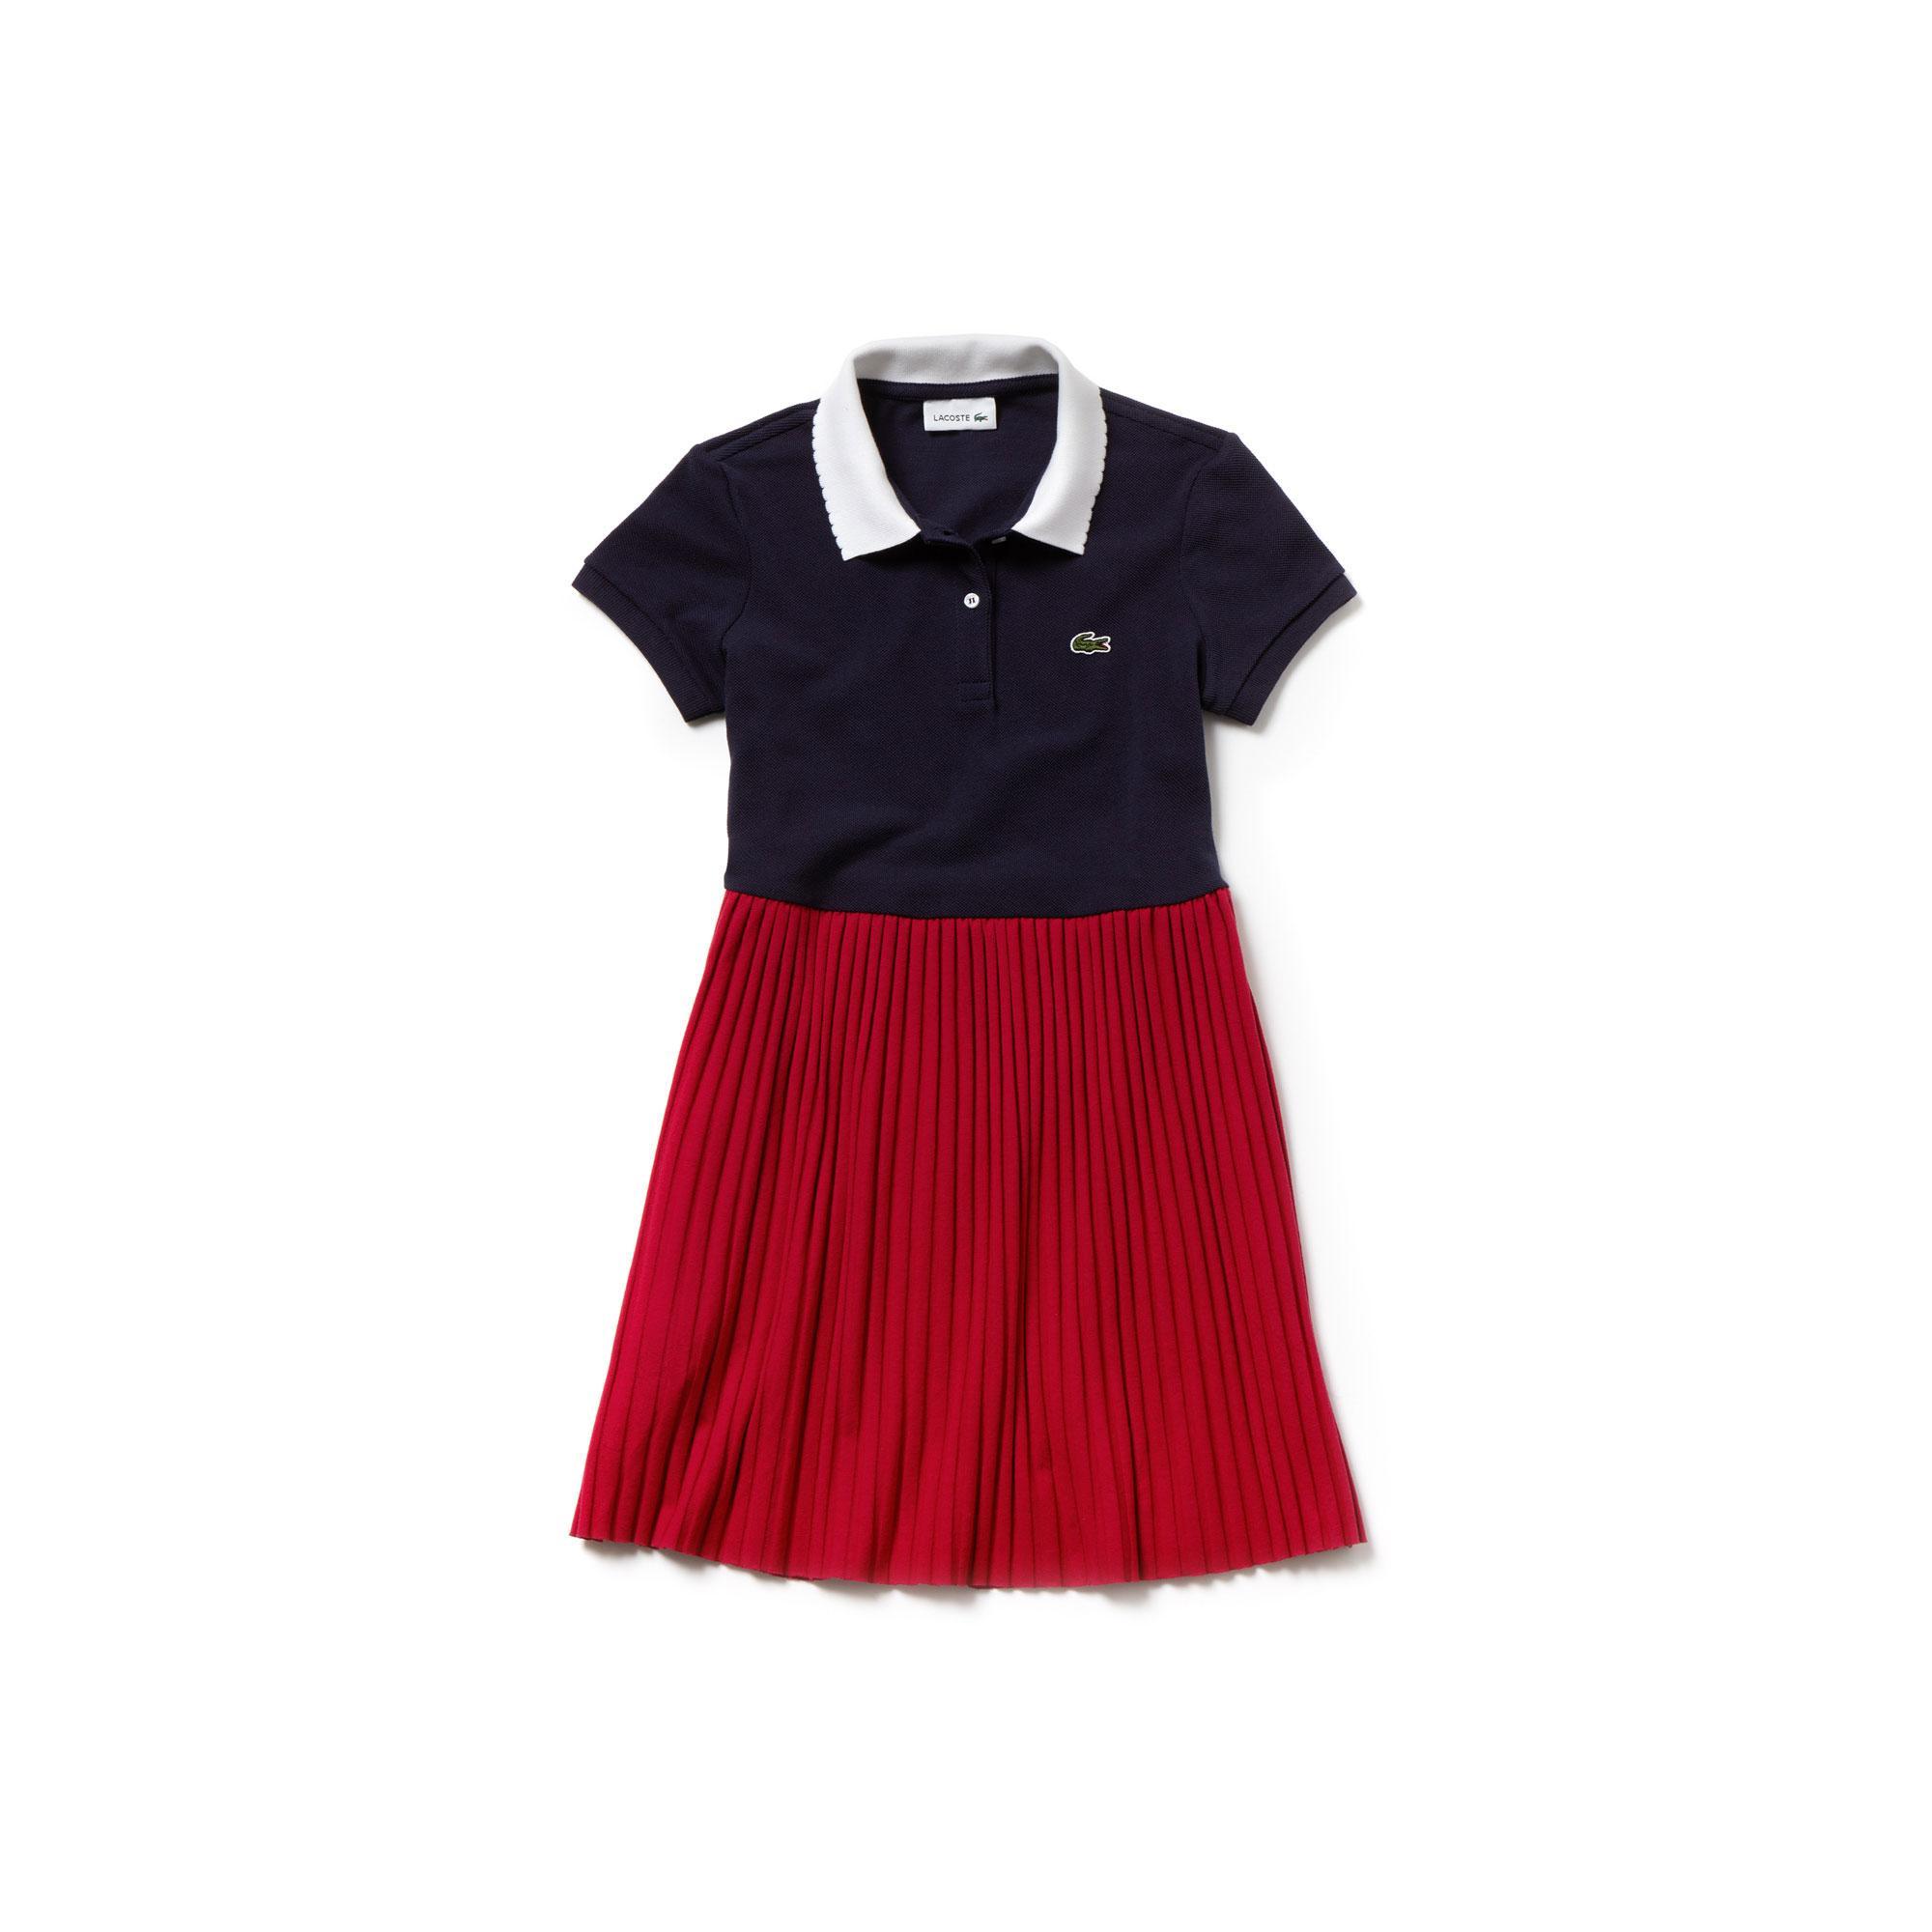 Lacoste Çocuk Lacivert-Pembe Elbise